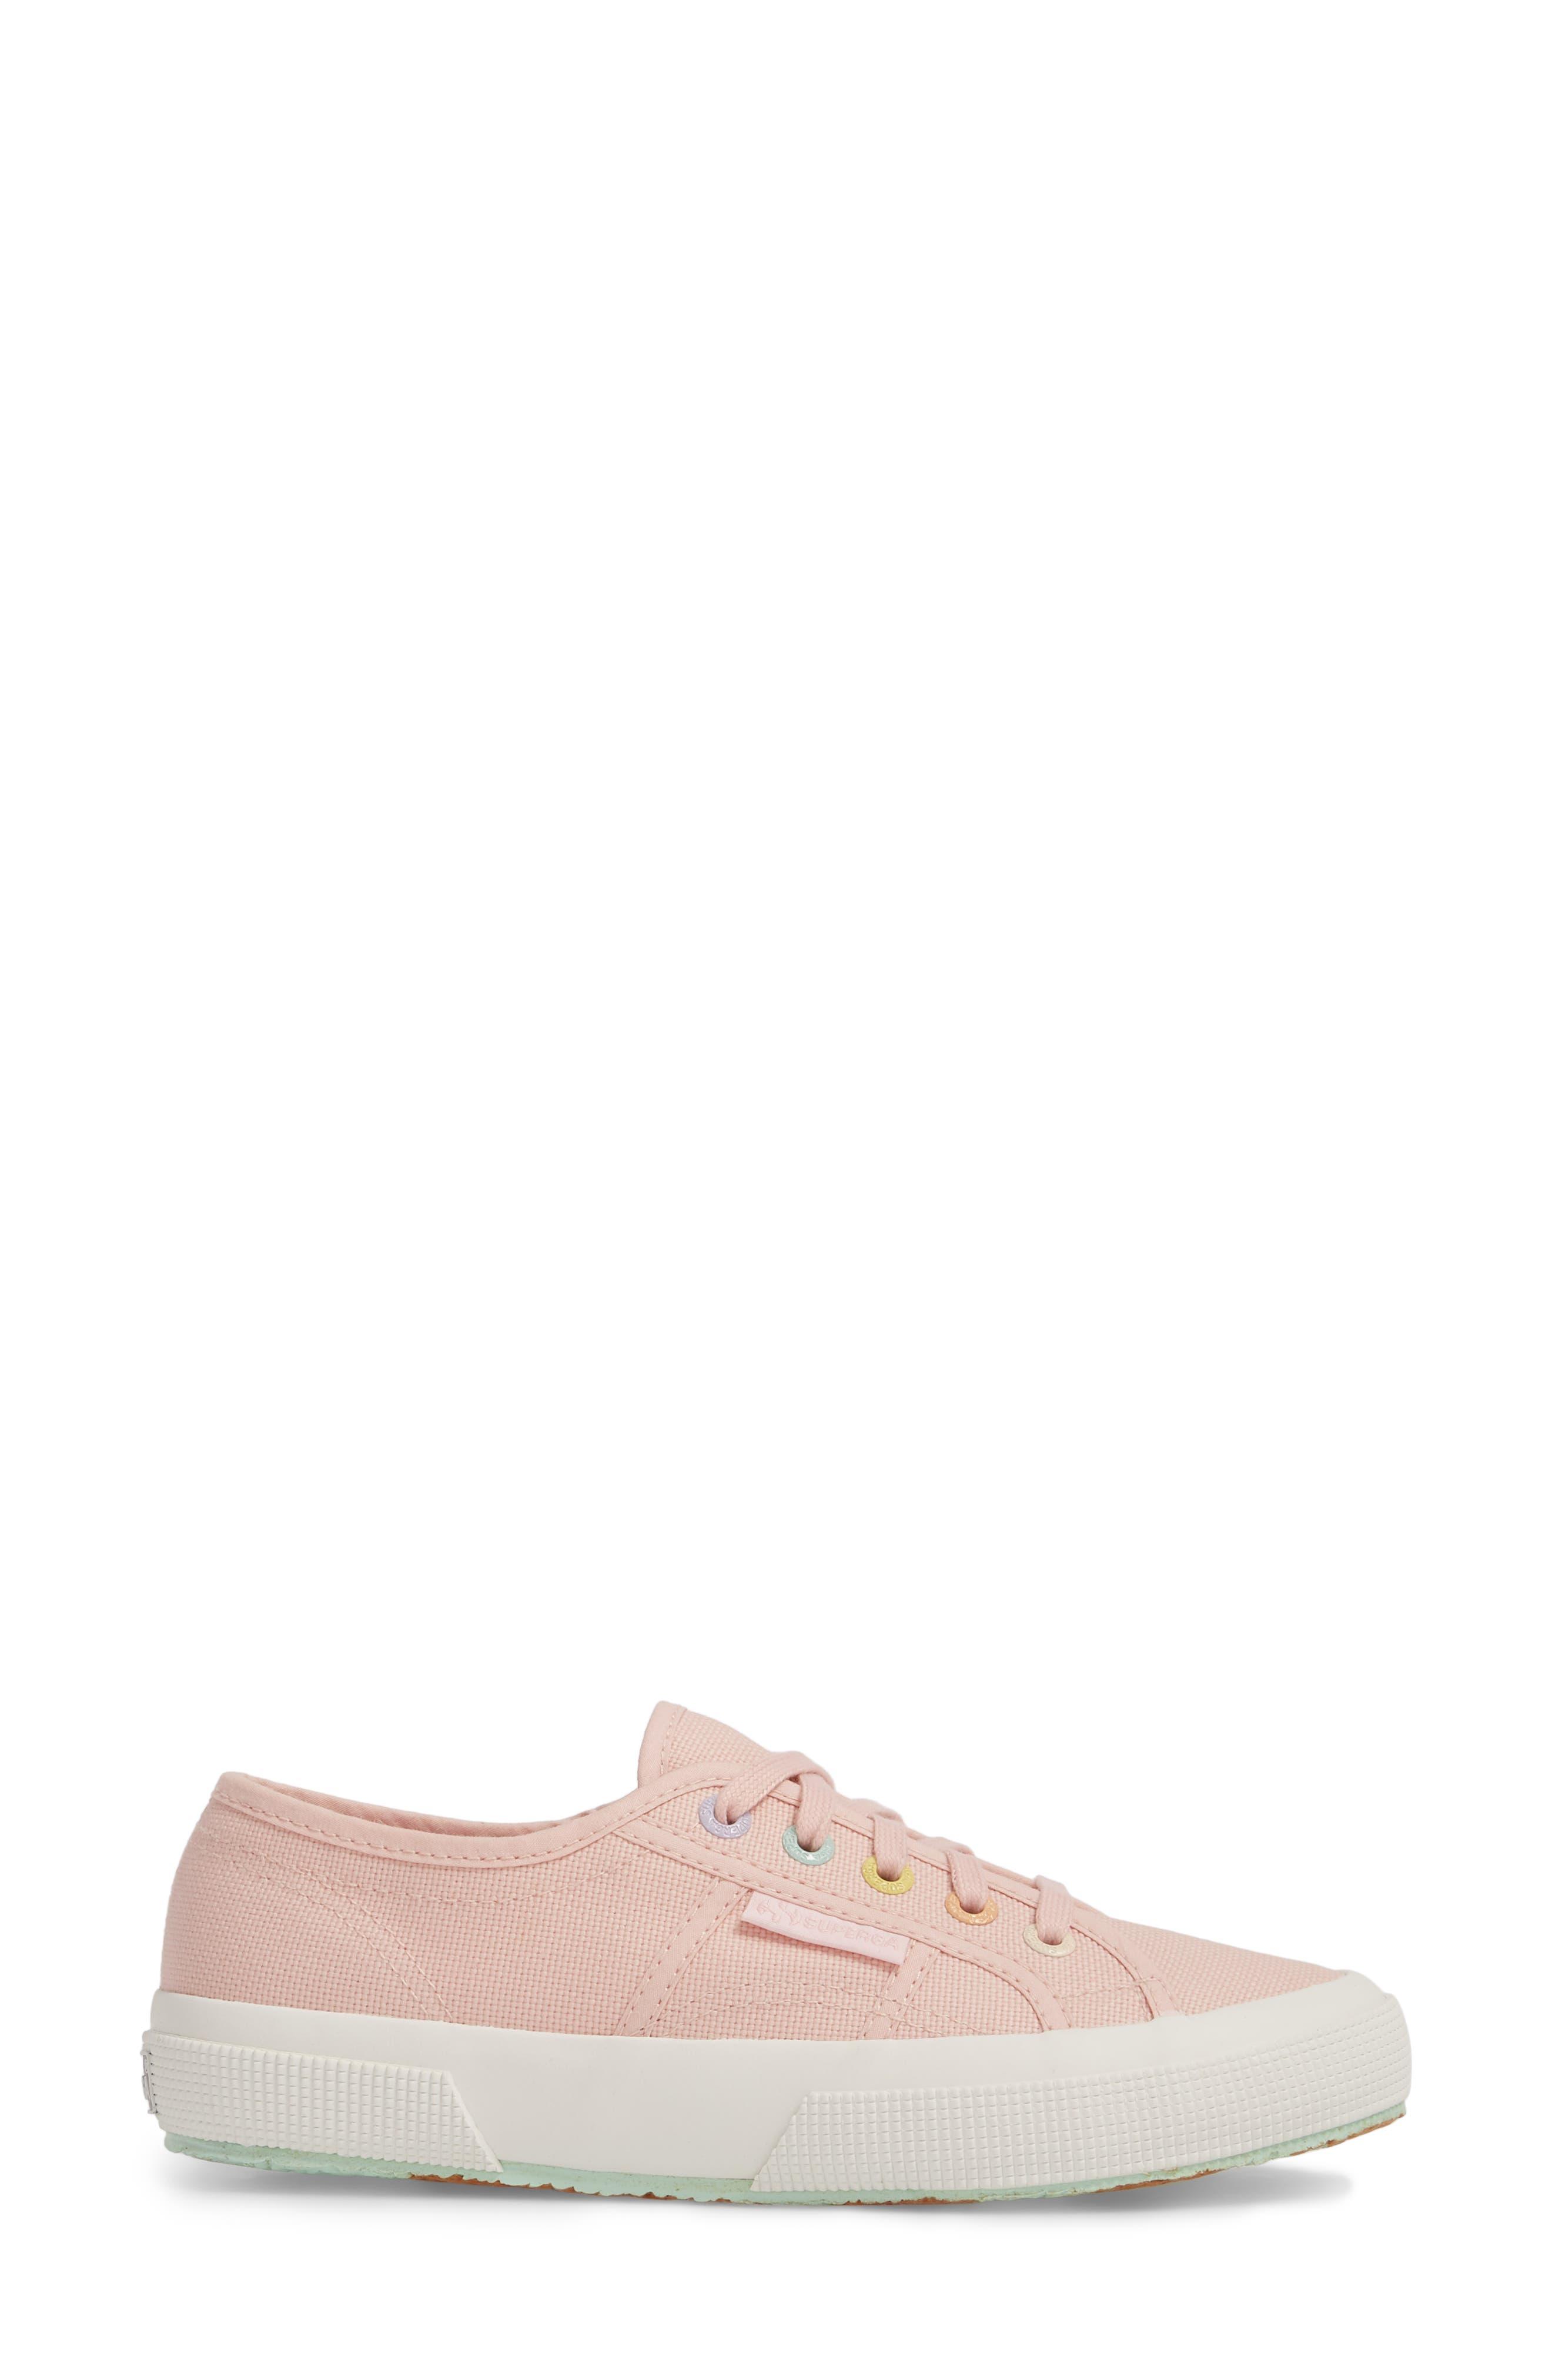 2750 Rainbow Sneaker,                             Alternate thumbnail 3, color,                             Light Pink